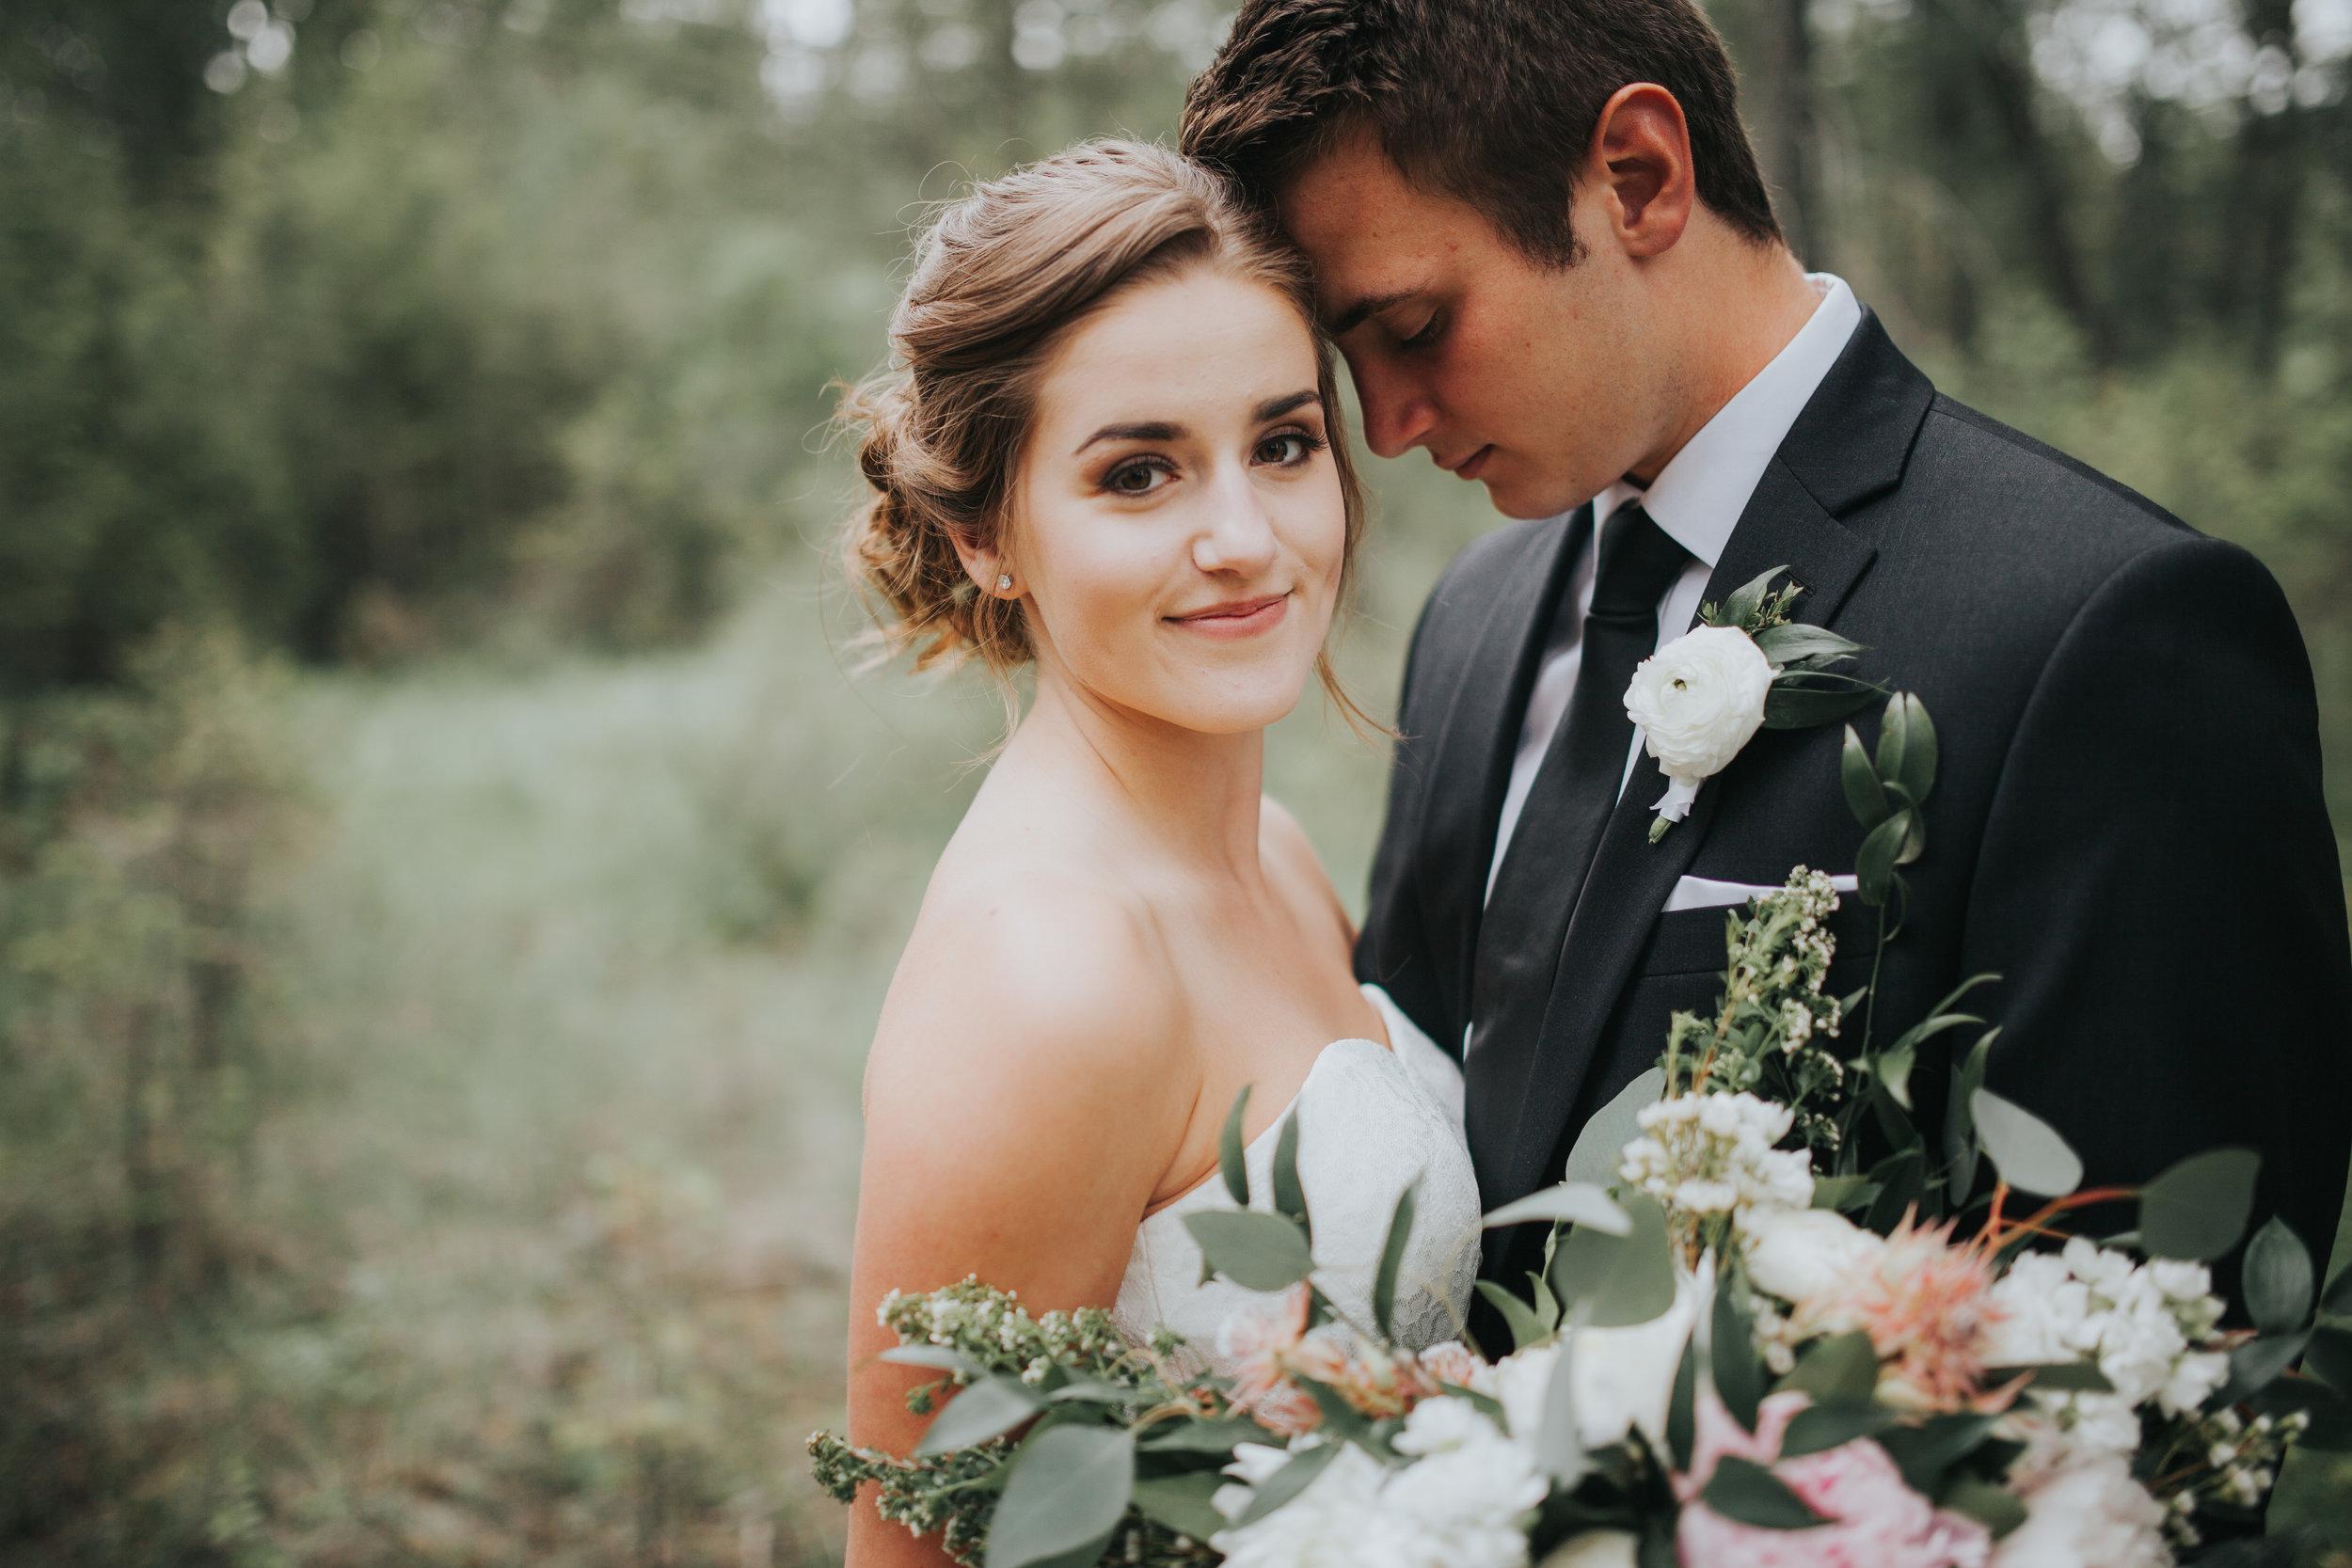 Ryter 4 - Bridal Portraits-120.jpg